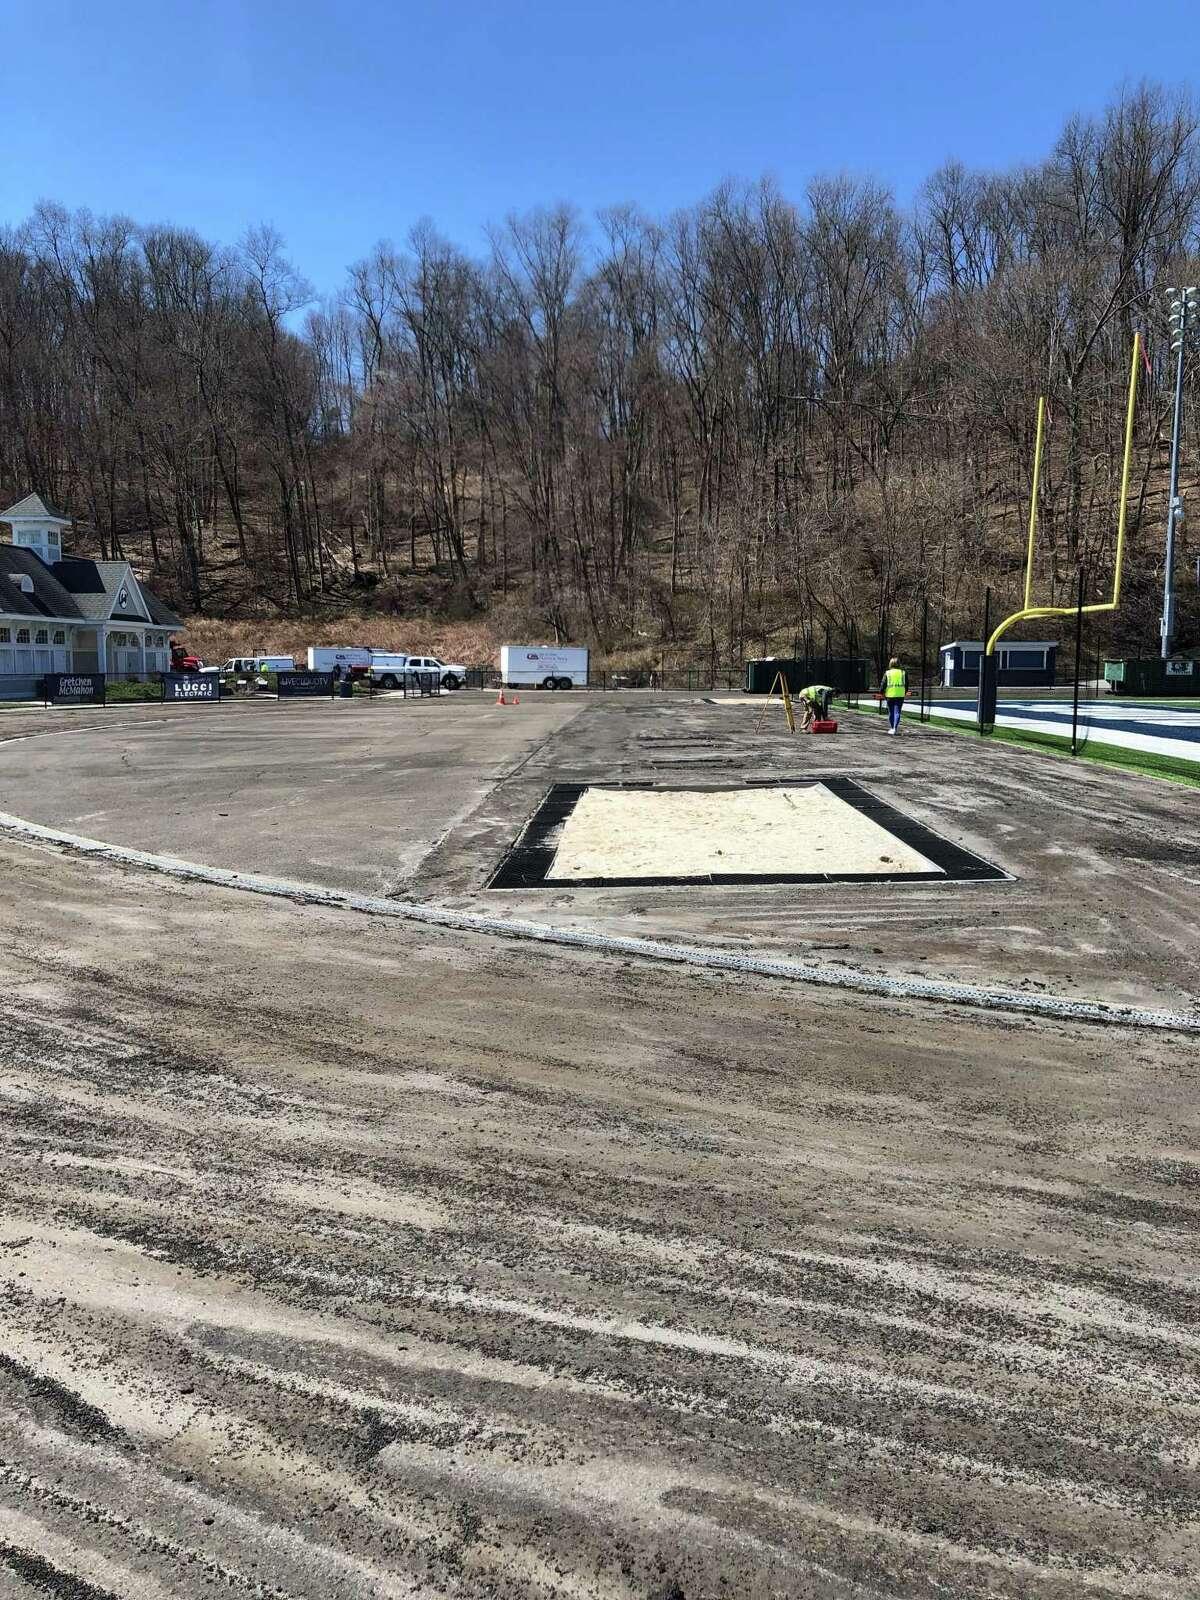 Last week's storm damaged Wilton's newly renovated track at Veterans Memorial Stadium.